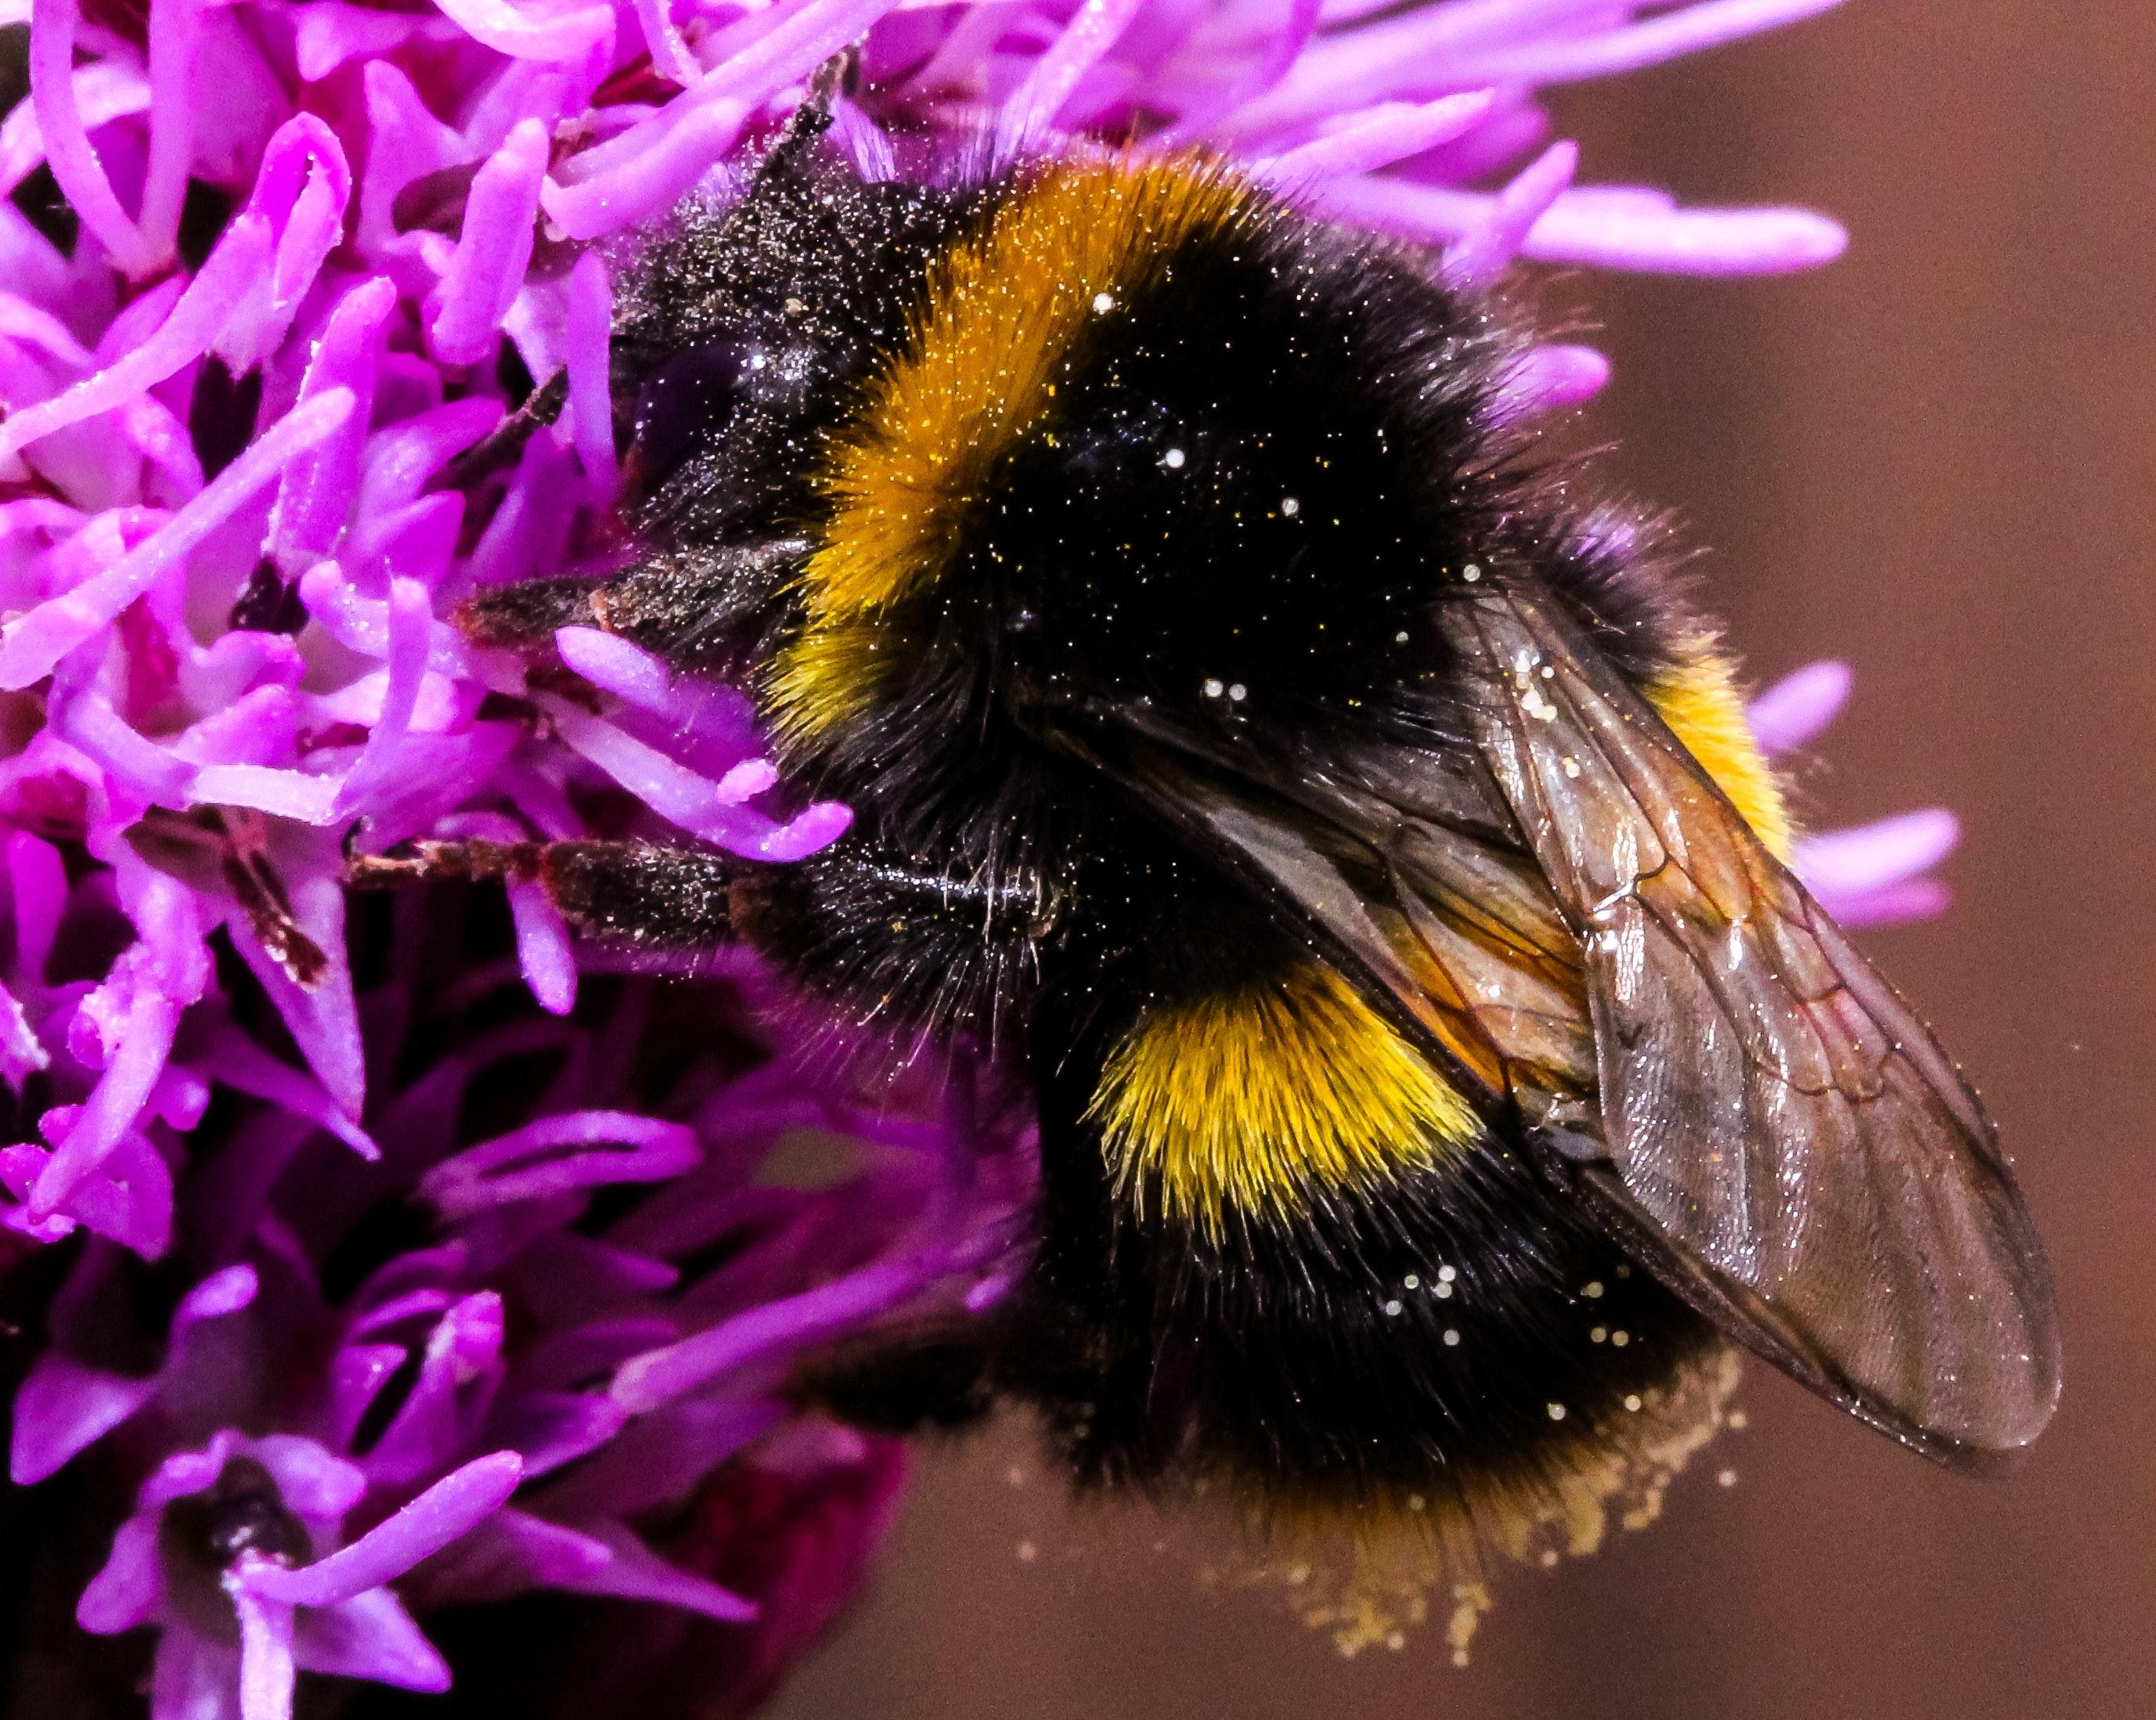 closeup photo of bumble bee on white flowers  u00b7 free stock